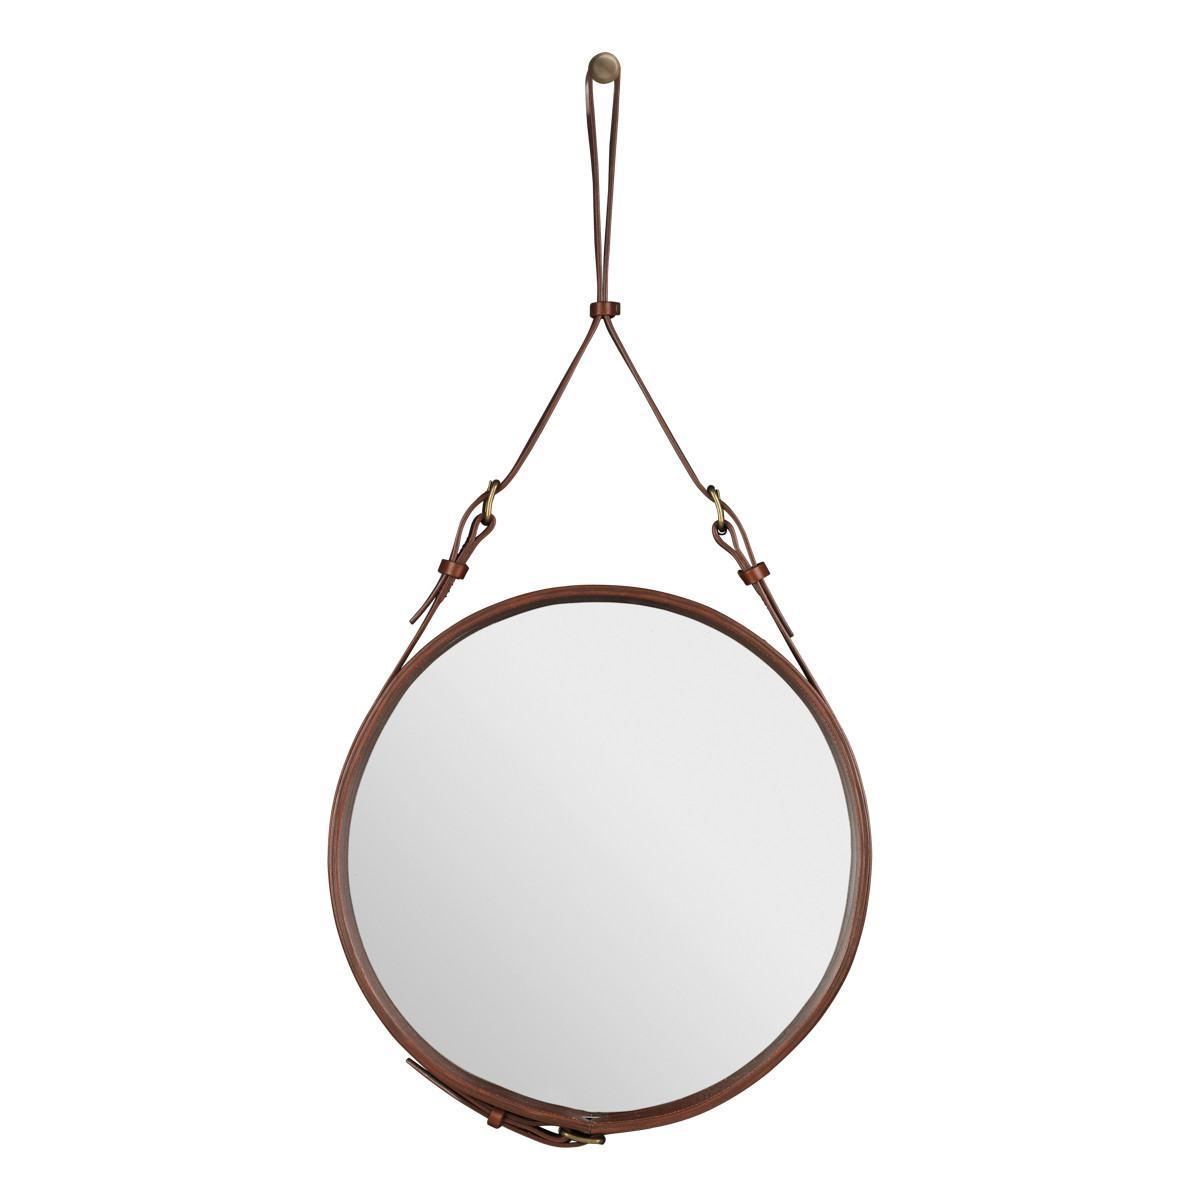 Gubi Adnet Mirror, Circular